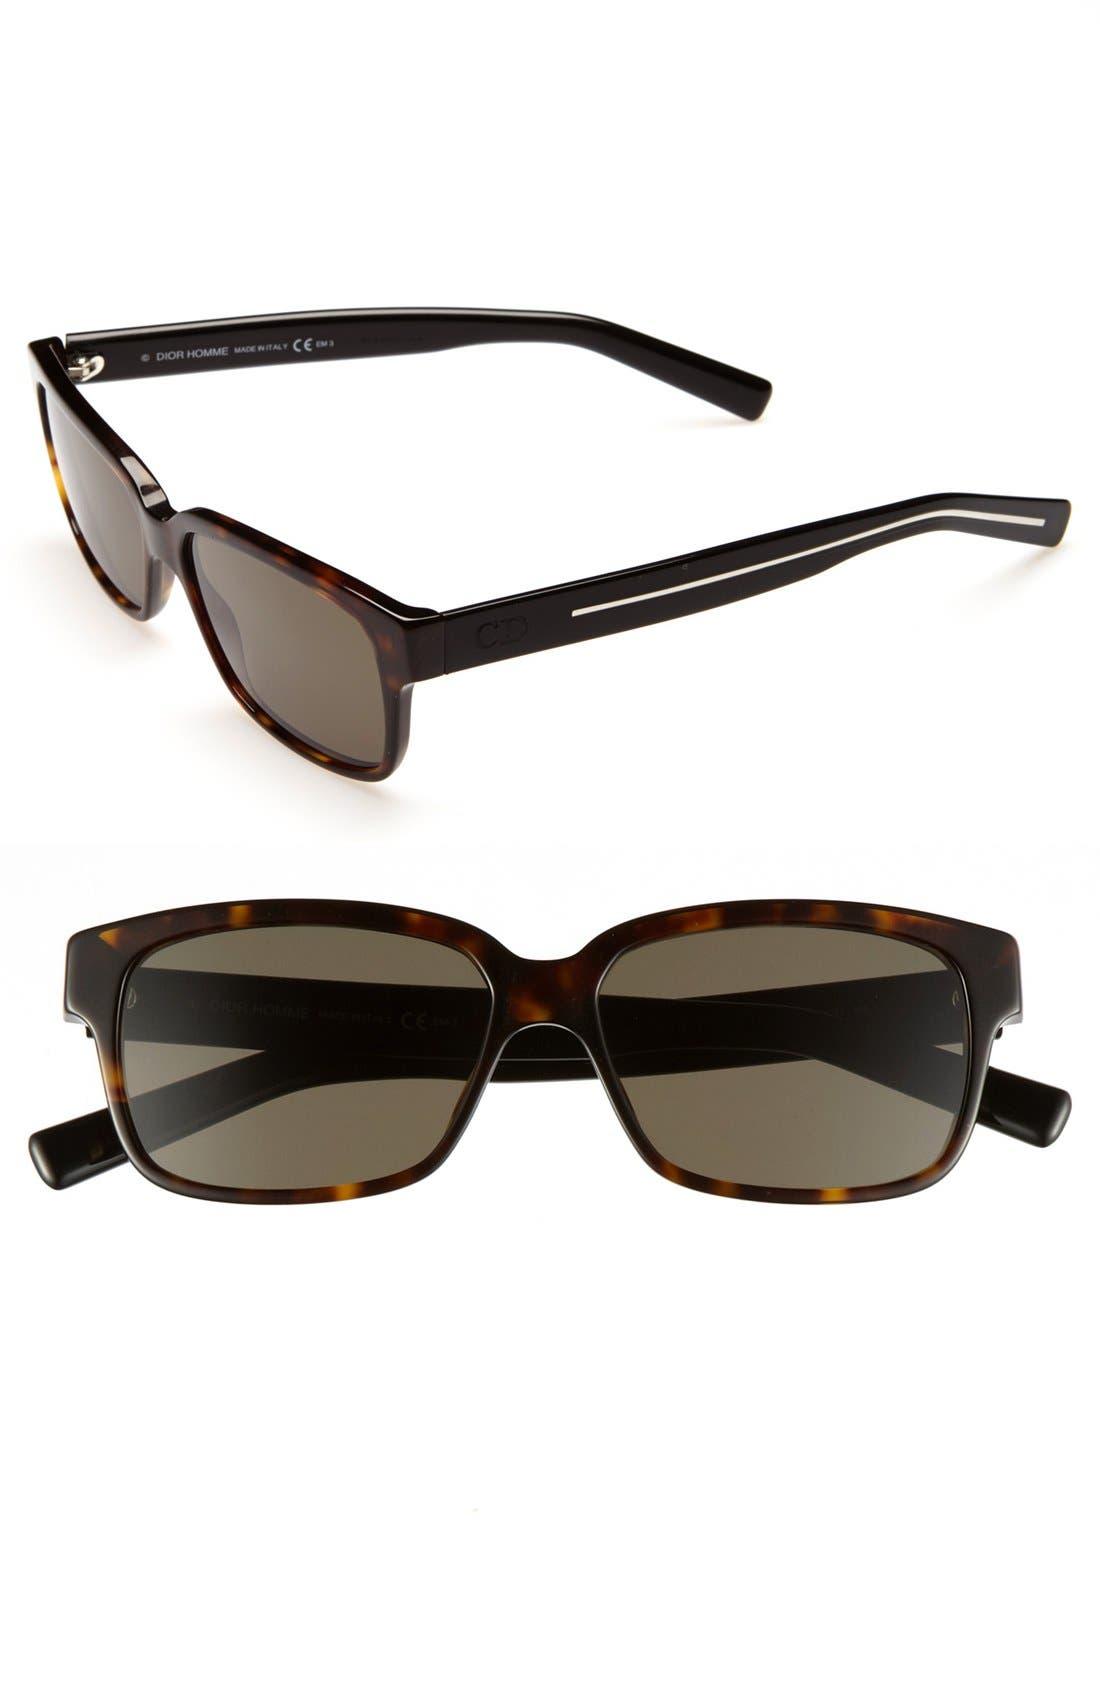 Alternate Image 1 Selected - Christian Dior '148S' 54mm Sunglasses